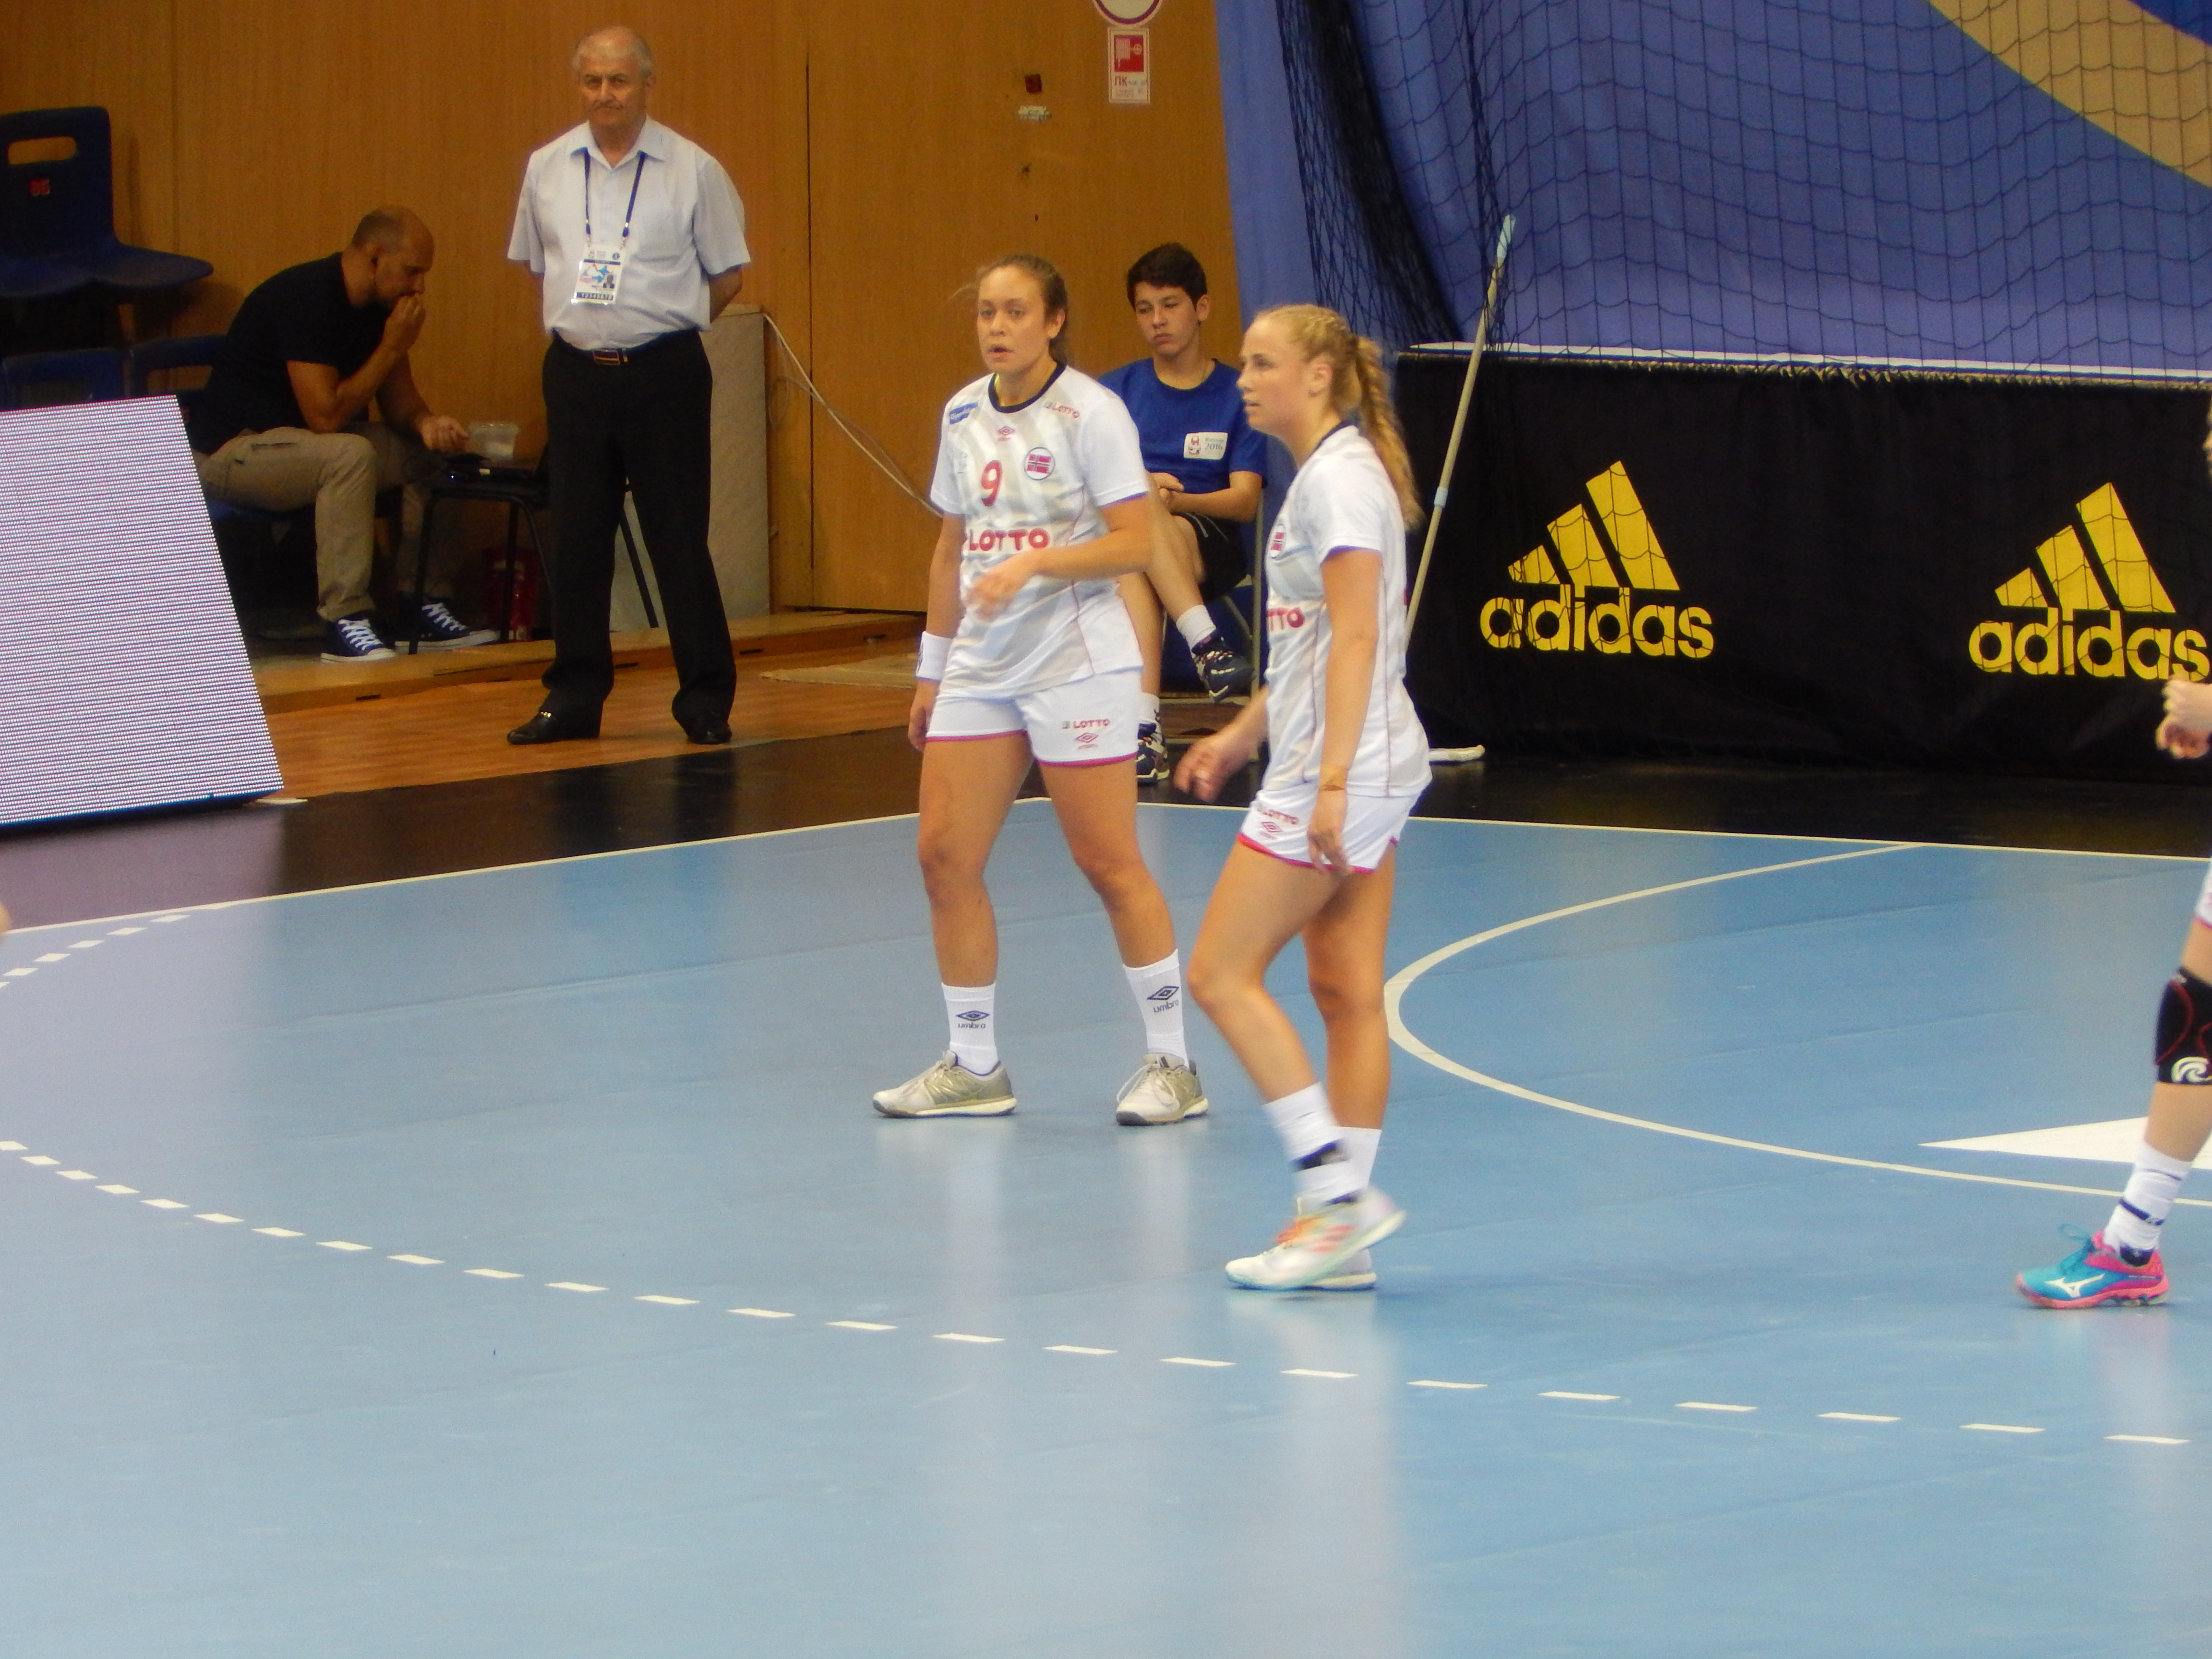 File:2016 Women's Junior World Handball Championship - Group A - HUN